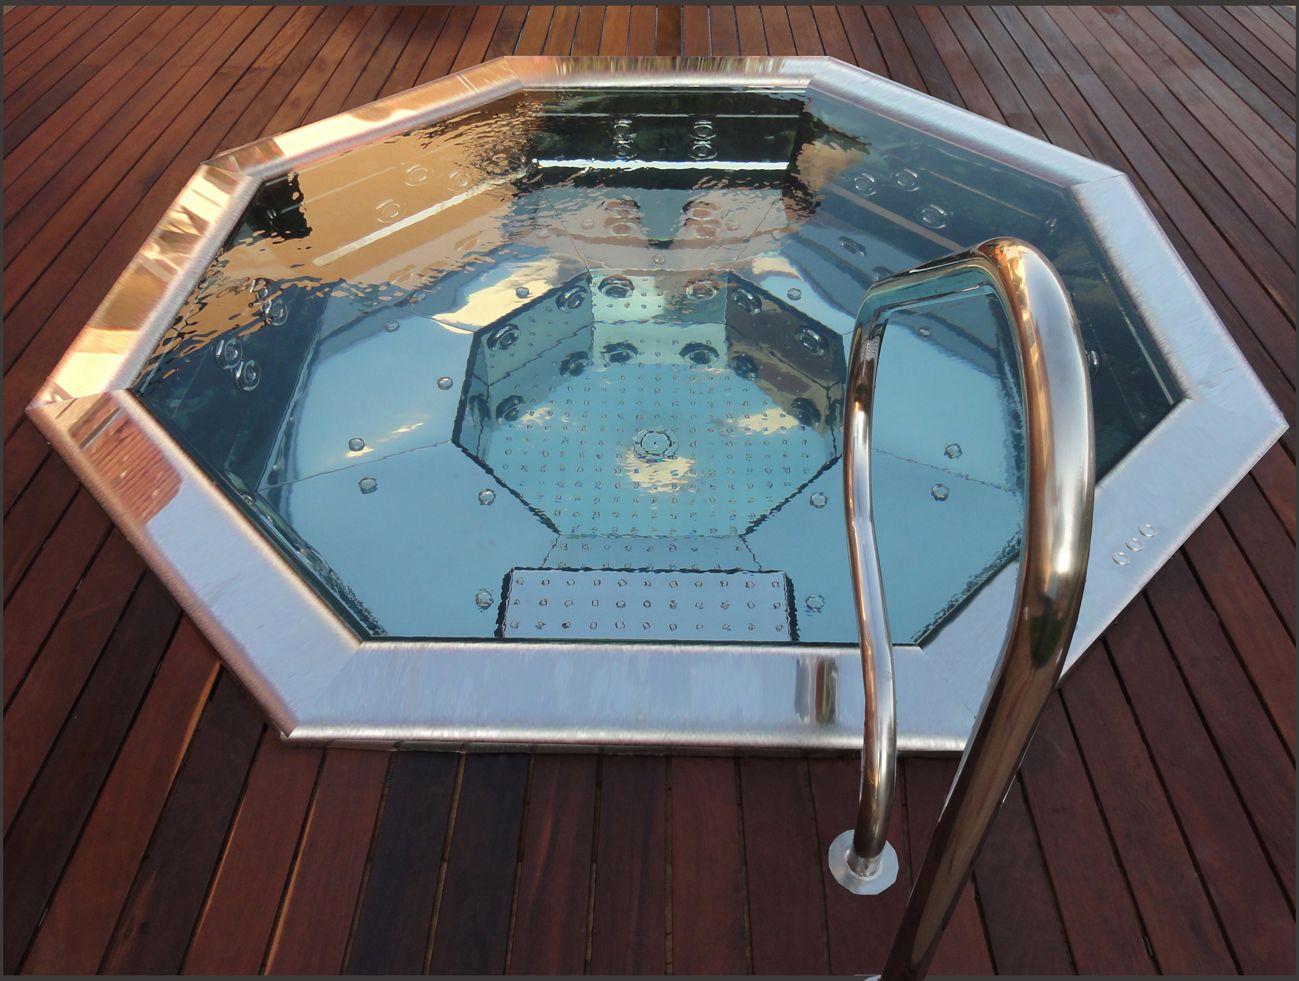 Piscine En Inox Steel And Style spas inox : elégance, design, qualité, | ouest spas